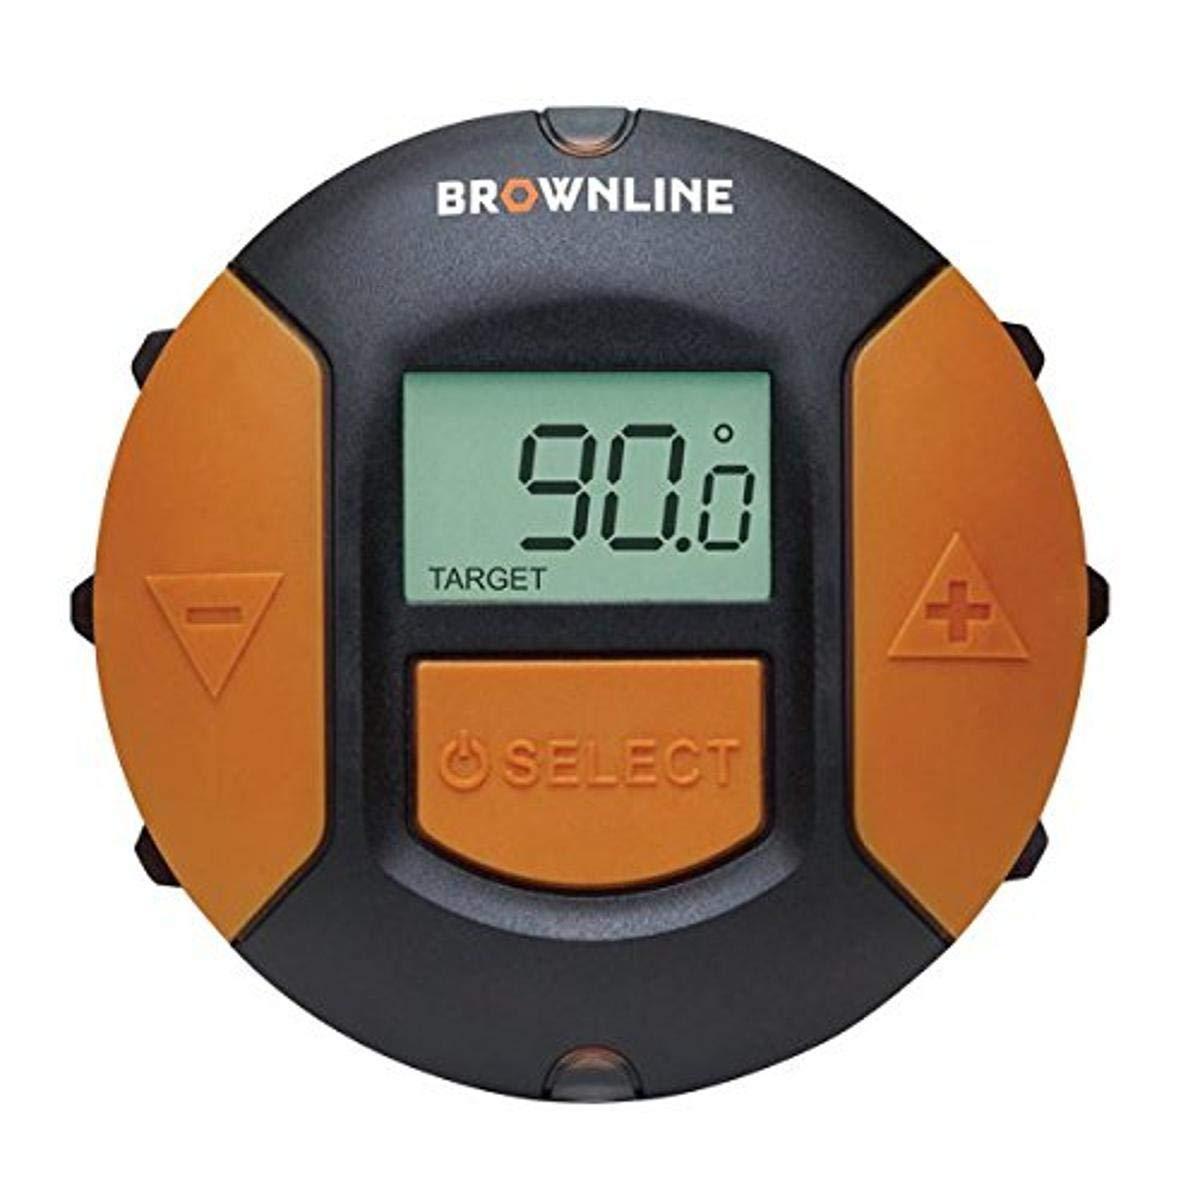 Brown Line Metalworks BLDAG001 Digital Angle Gauge £68.23 (UK Mainland) via Amazon US on Amazon